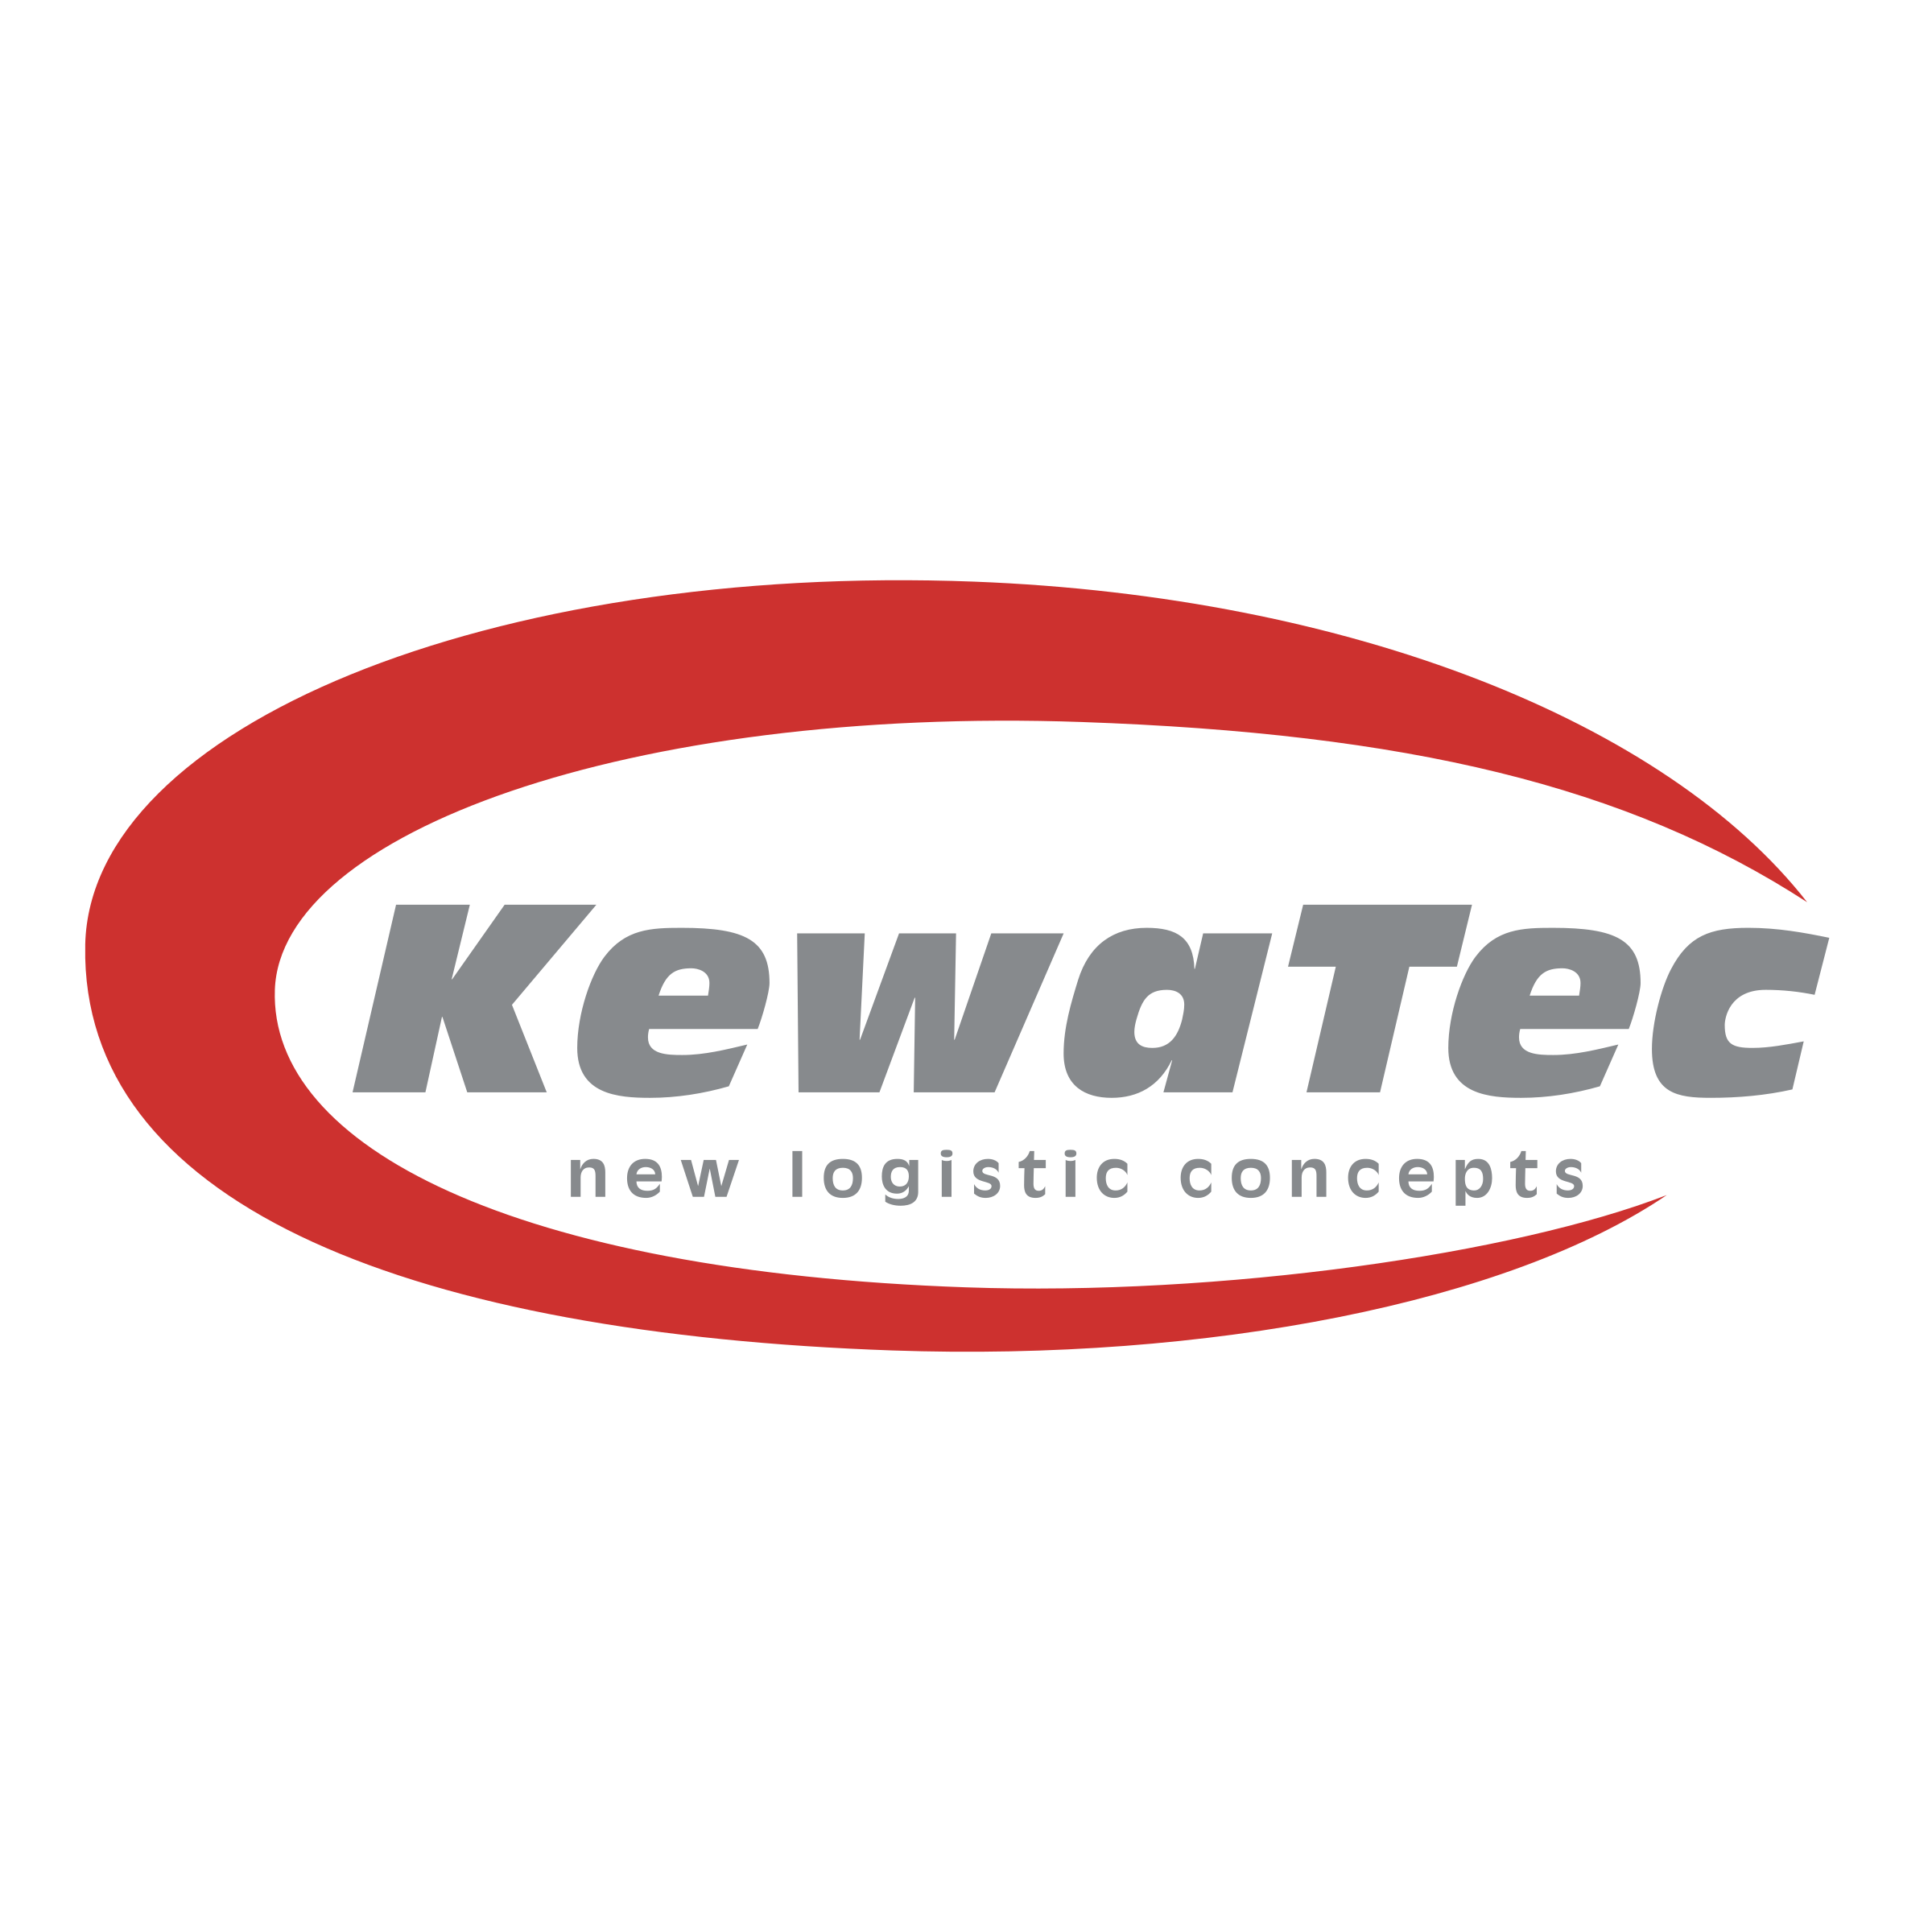 svg transparent Kewatec png transparent svg. Vector concepts logo